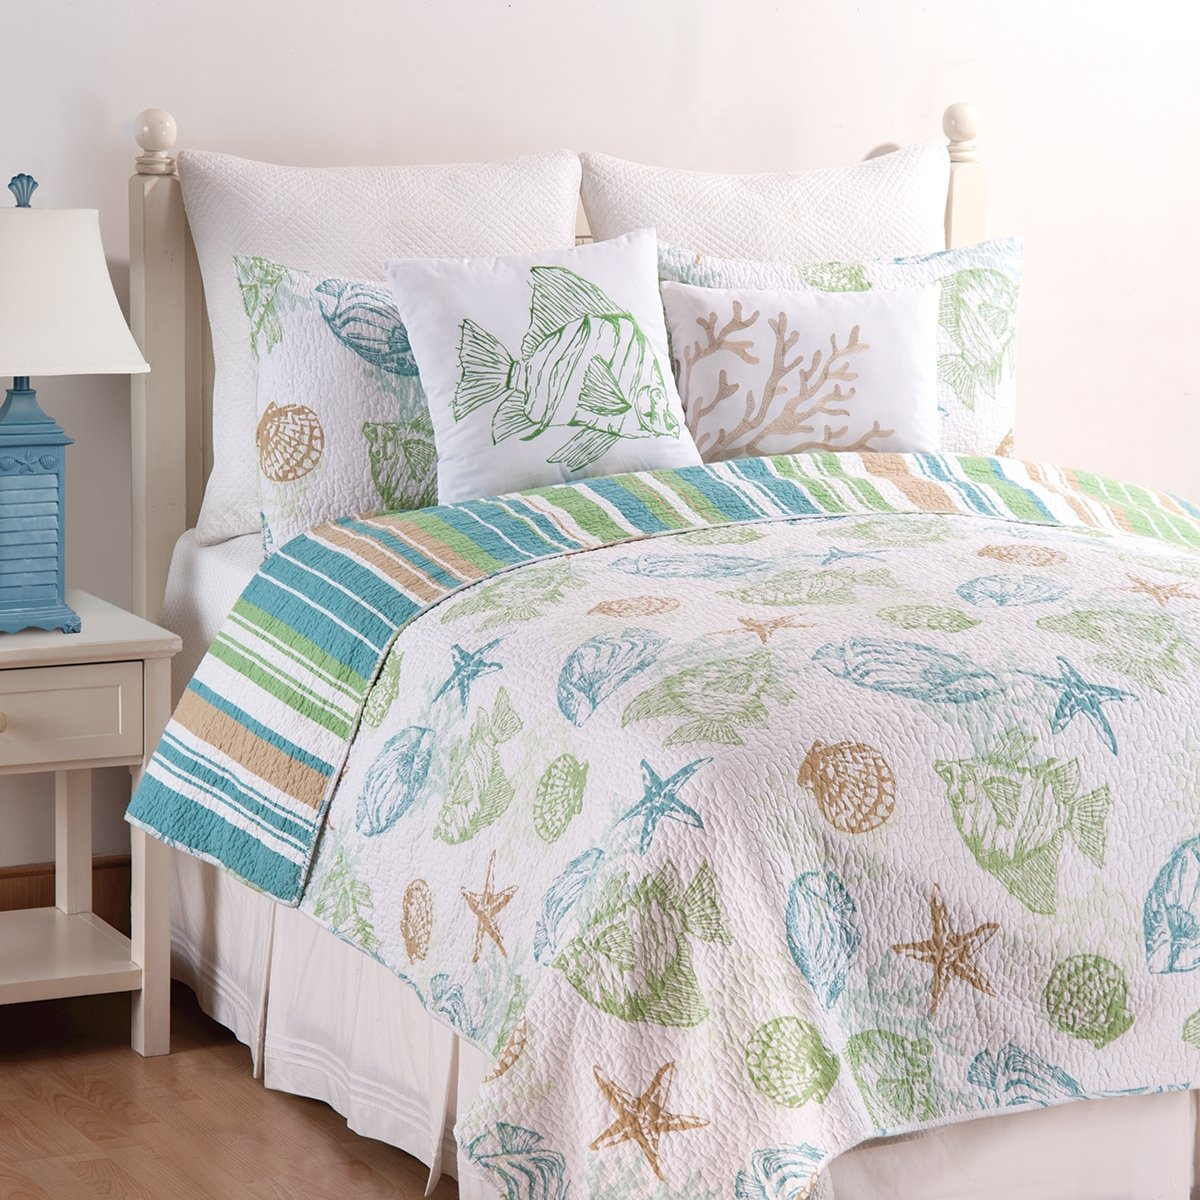 C&F Home Reef Point Coastal Quilt Set, Twin, Blue